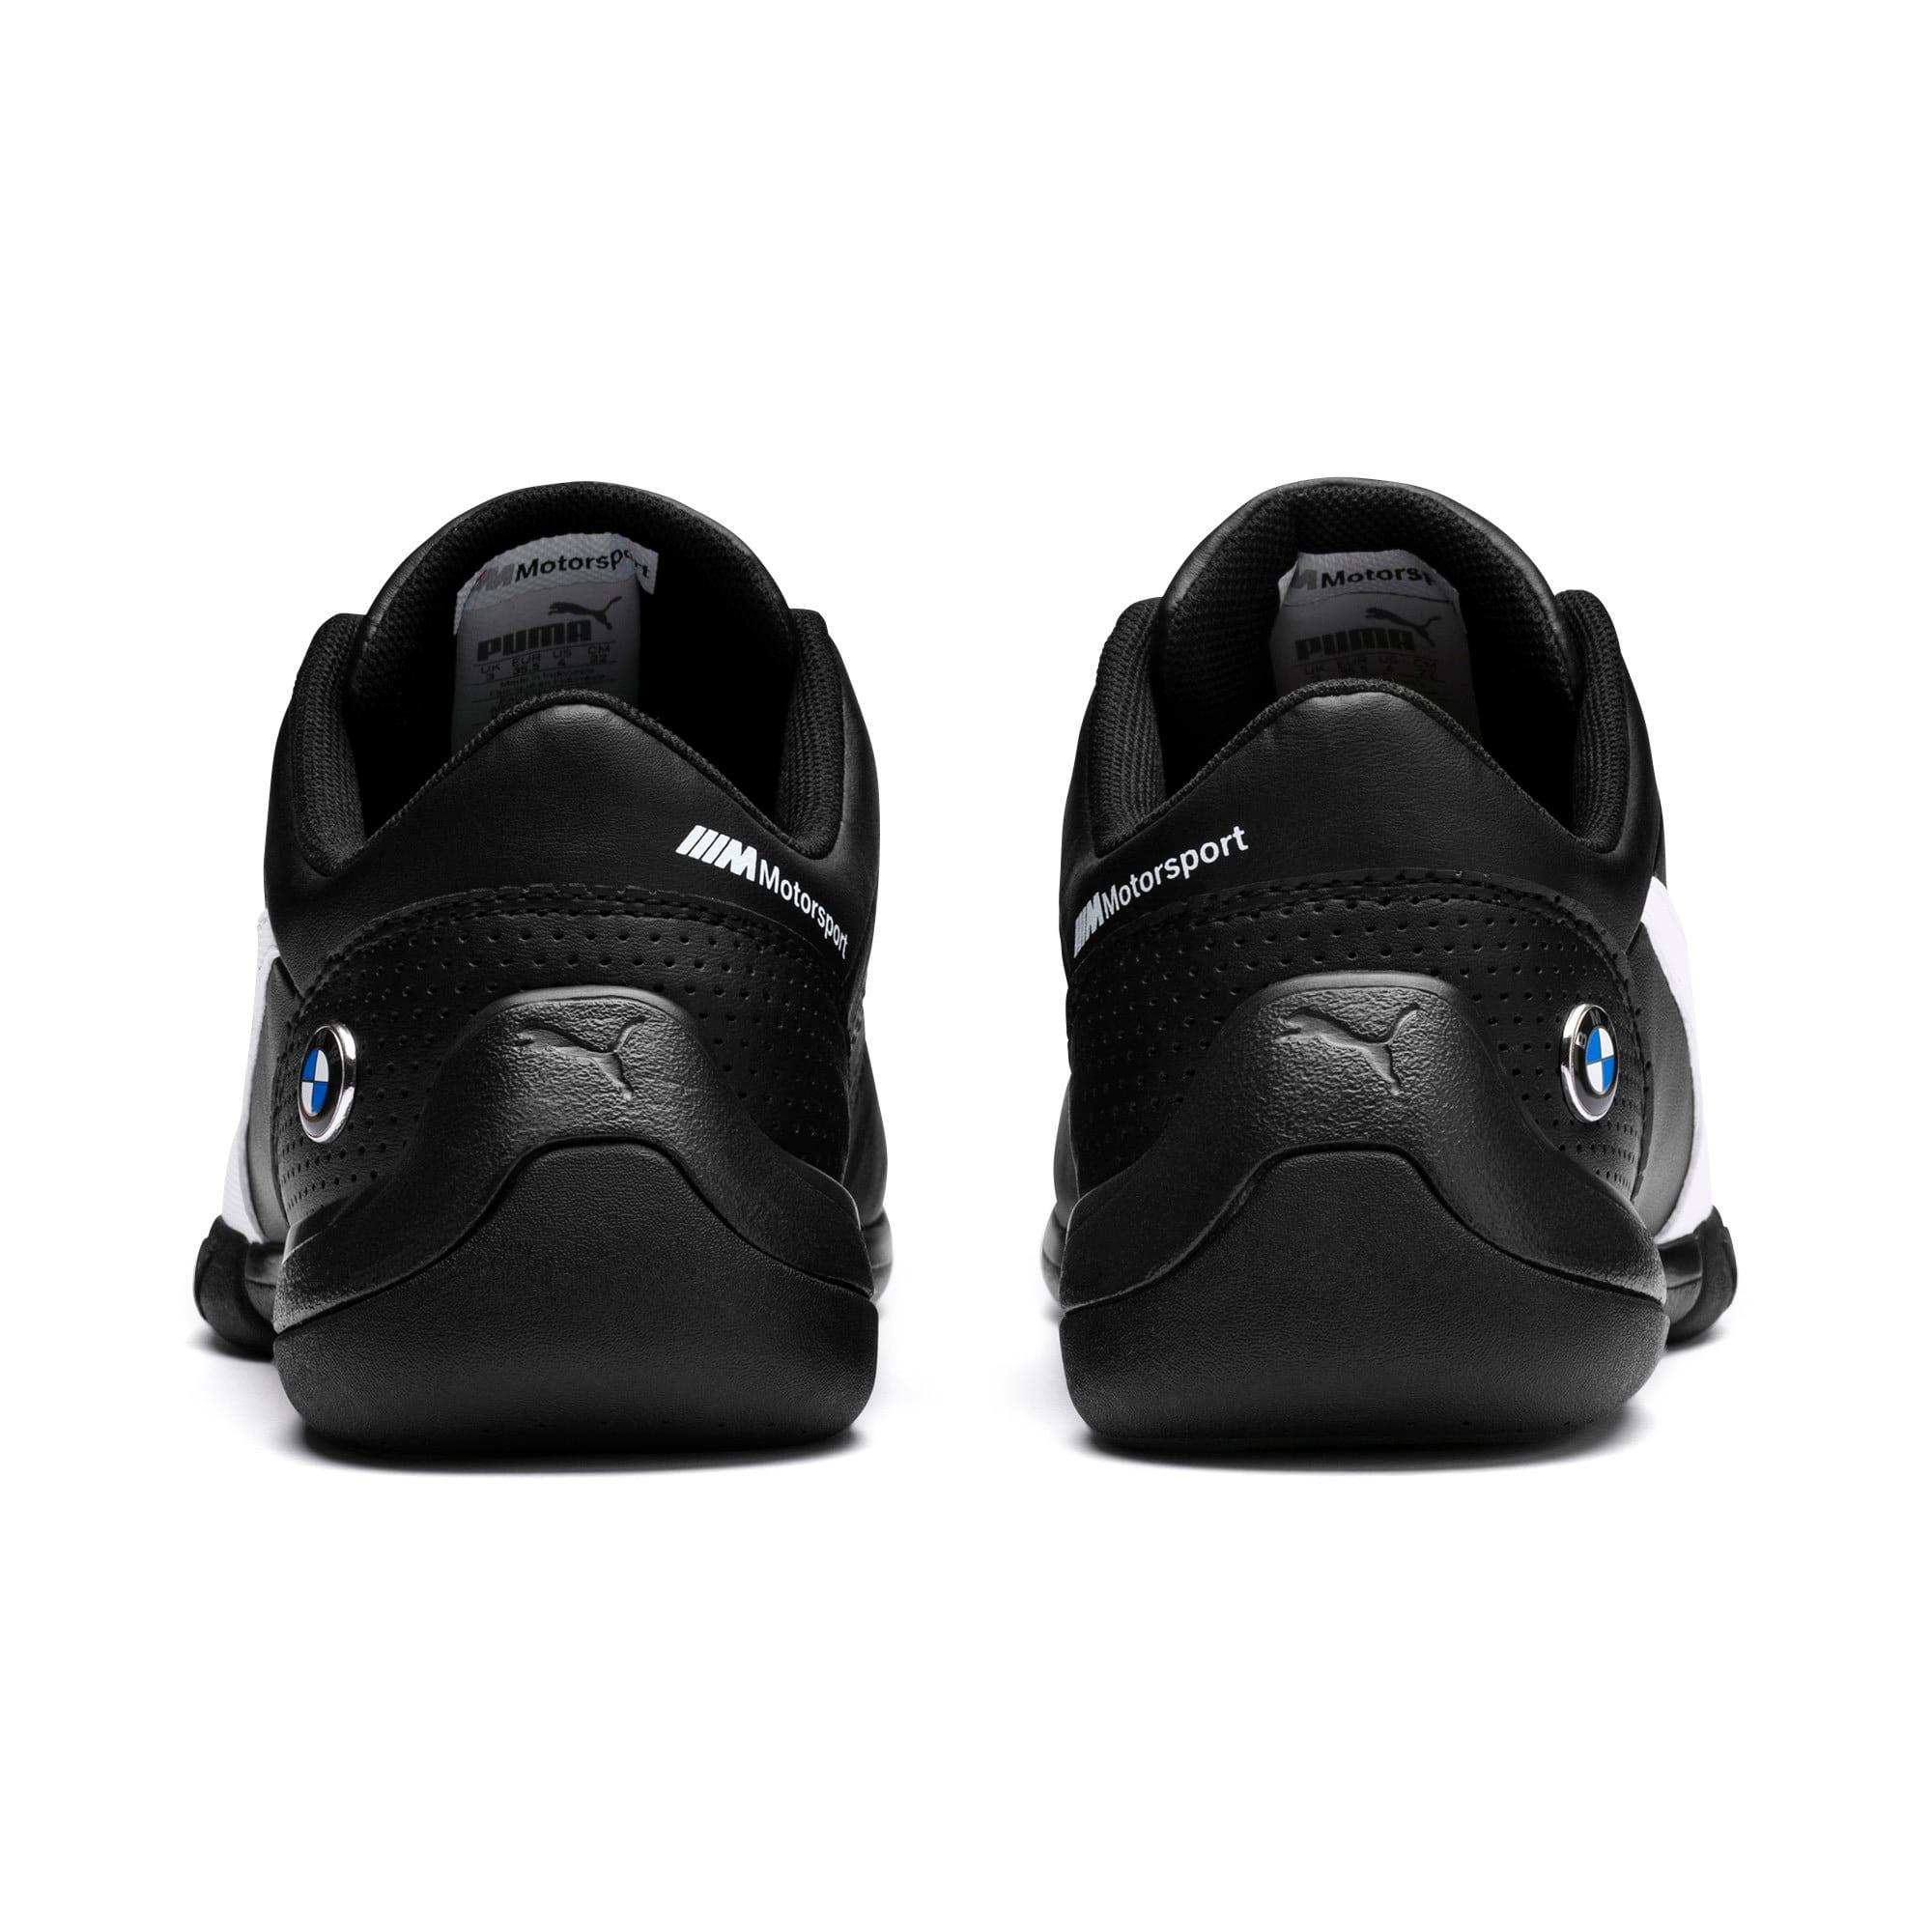 Thumbnail 4 of BMW MMS Kart Cat III Shoes JR, Puma Black-Puma White, medium